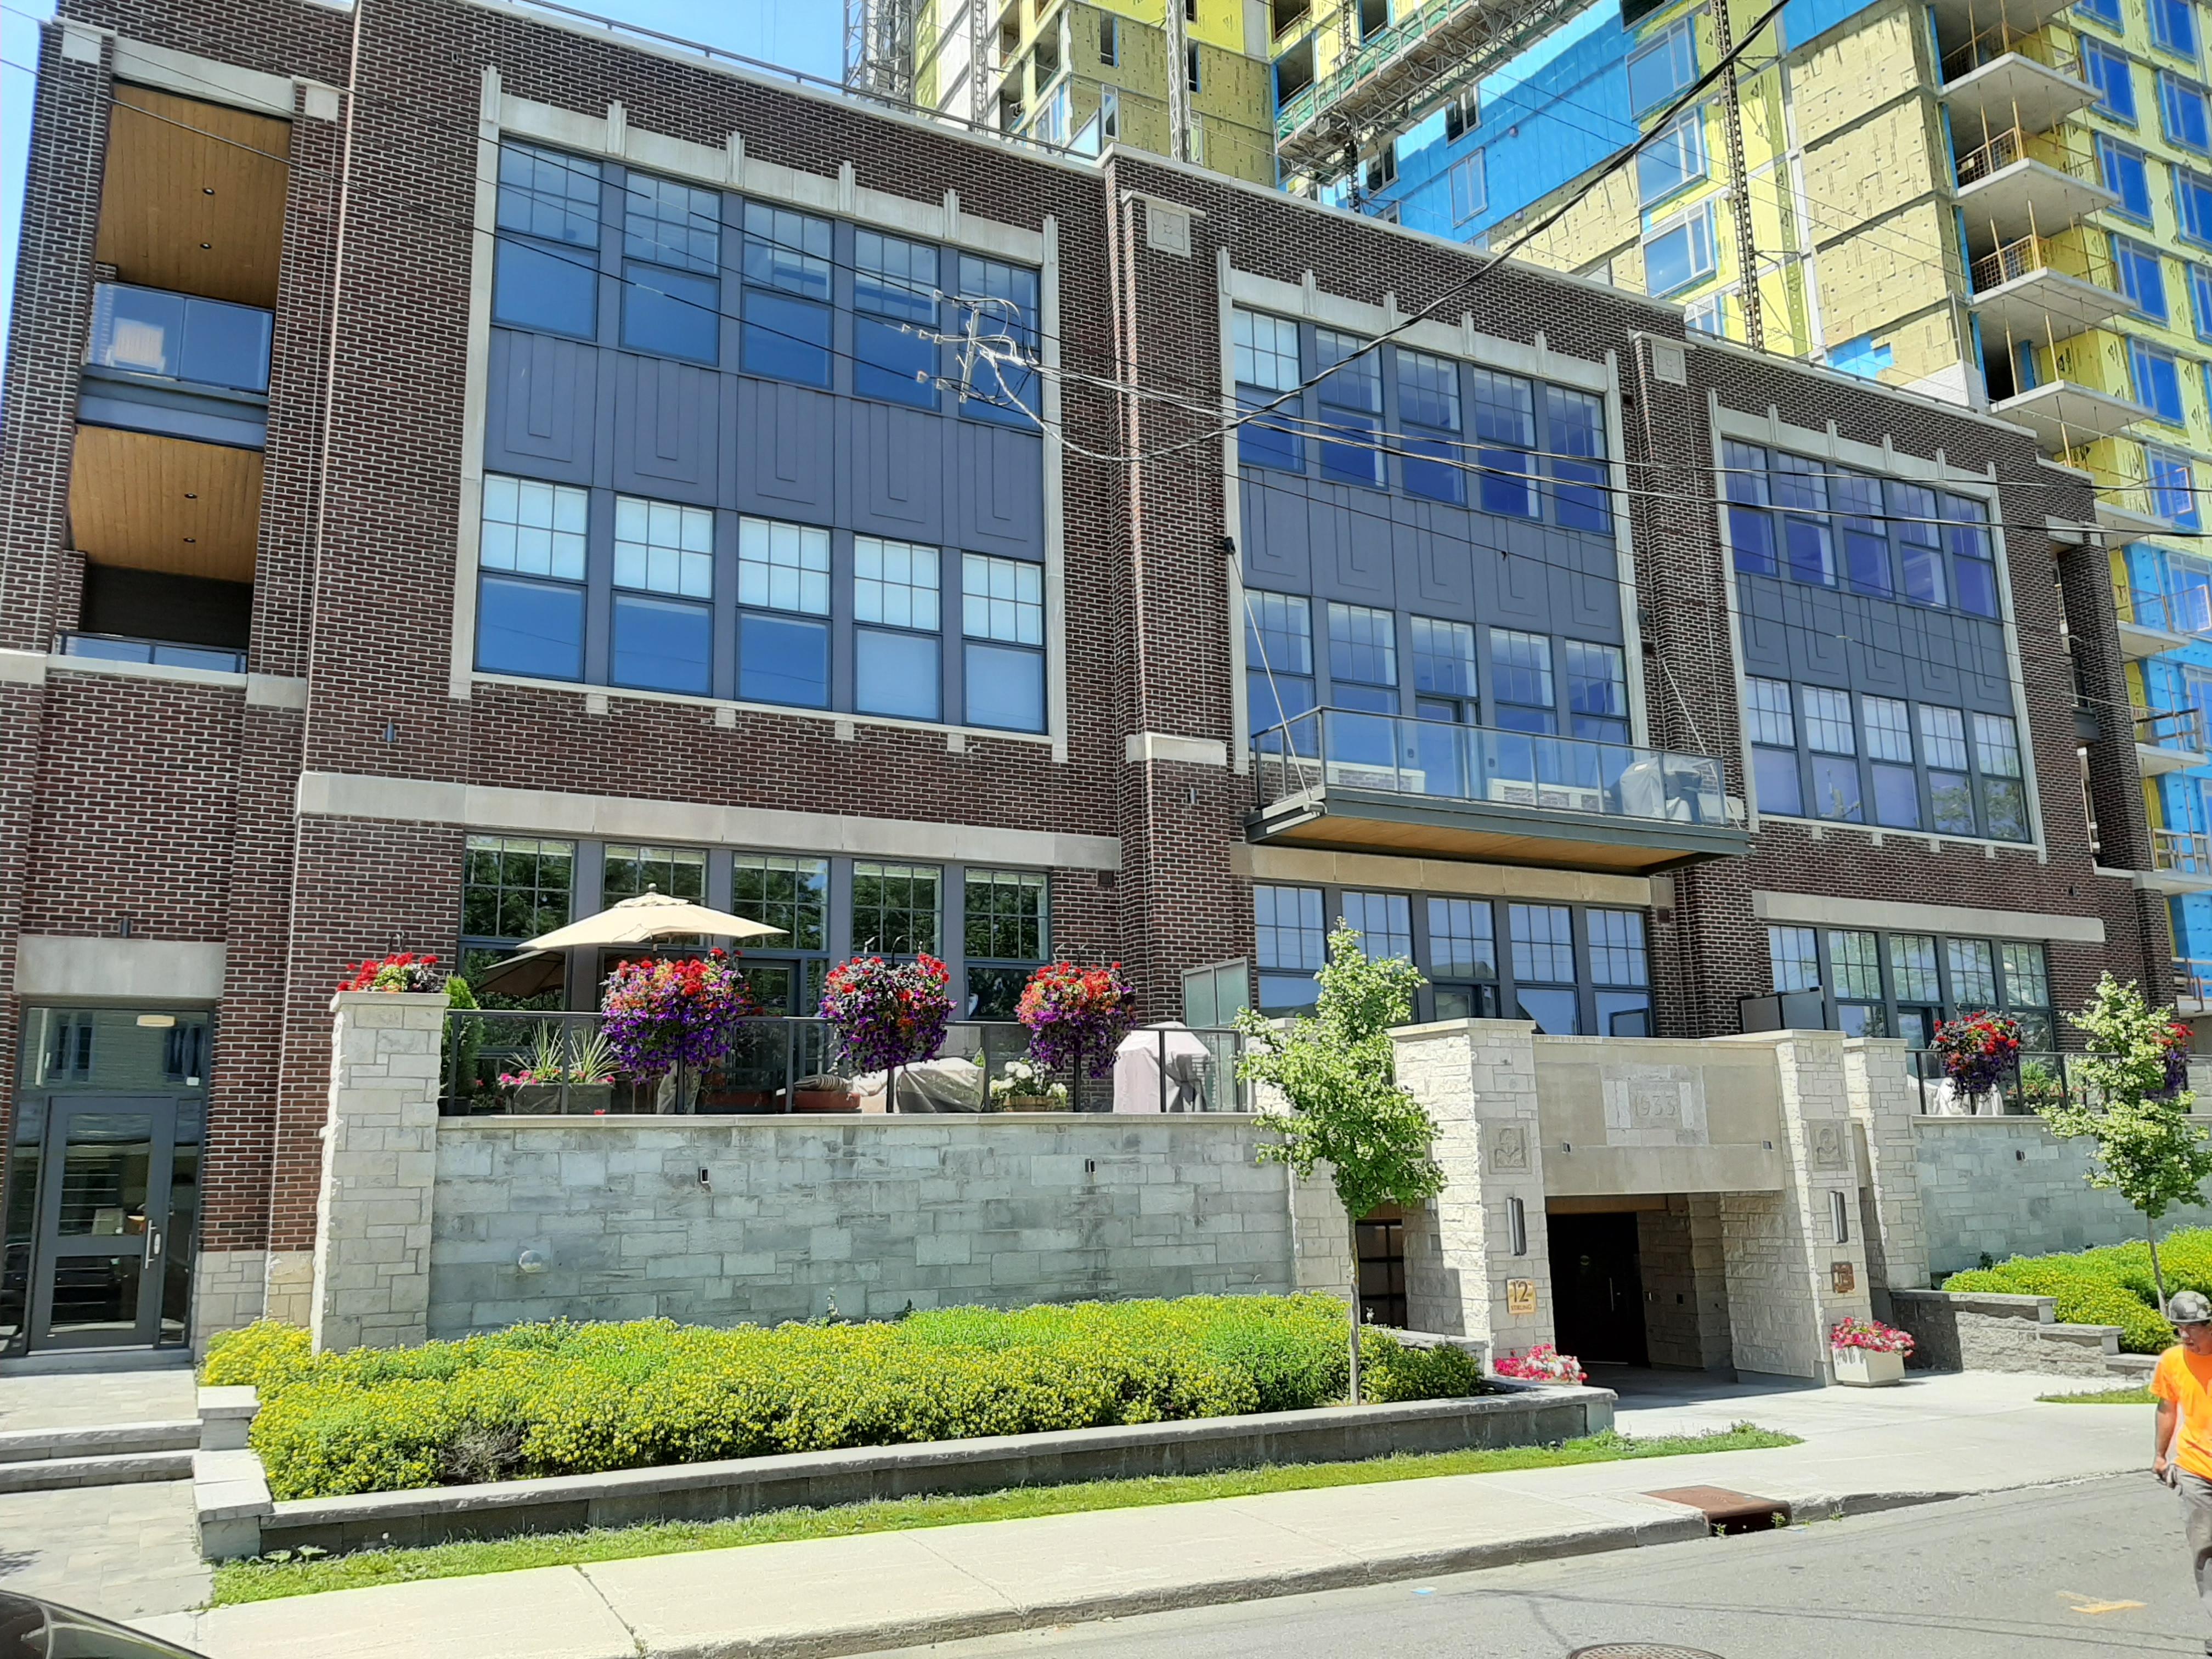 Yard and Station Condo Ottawa Exterior